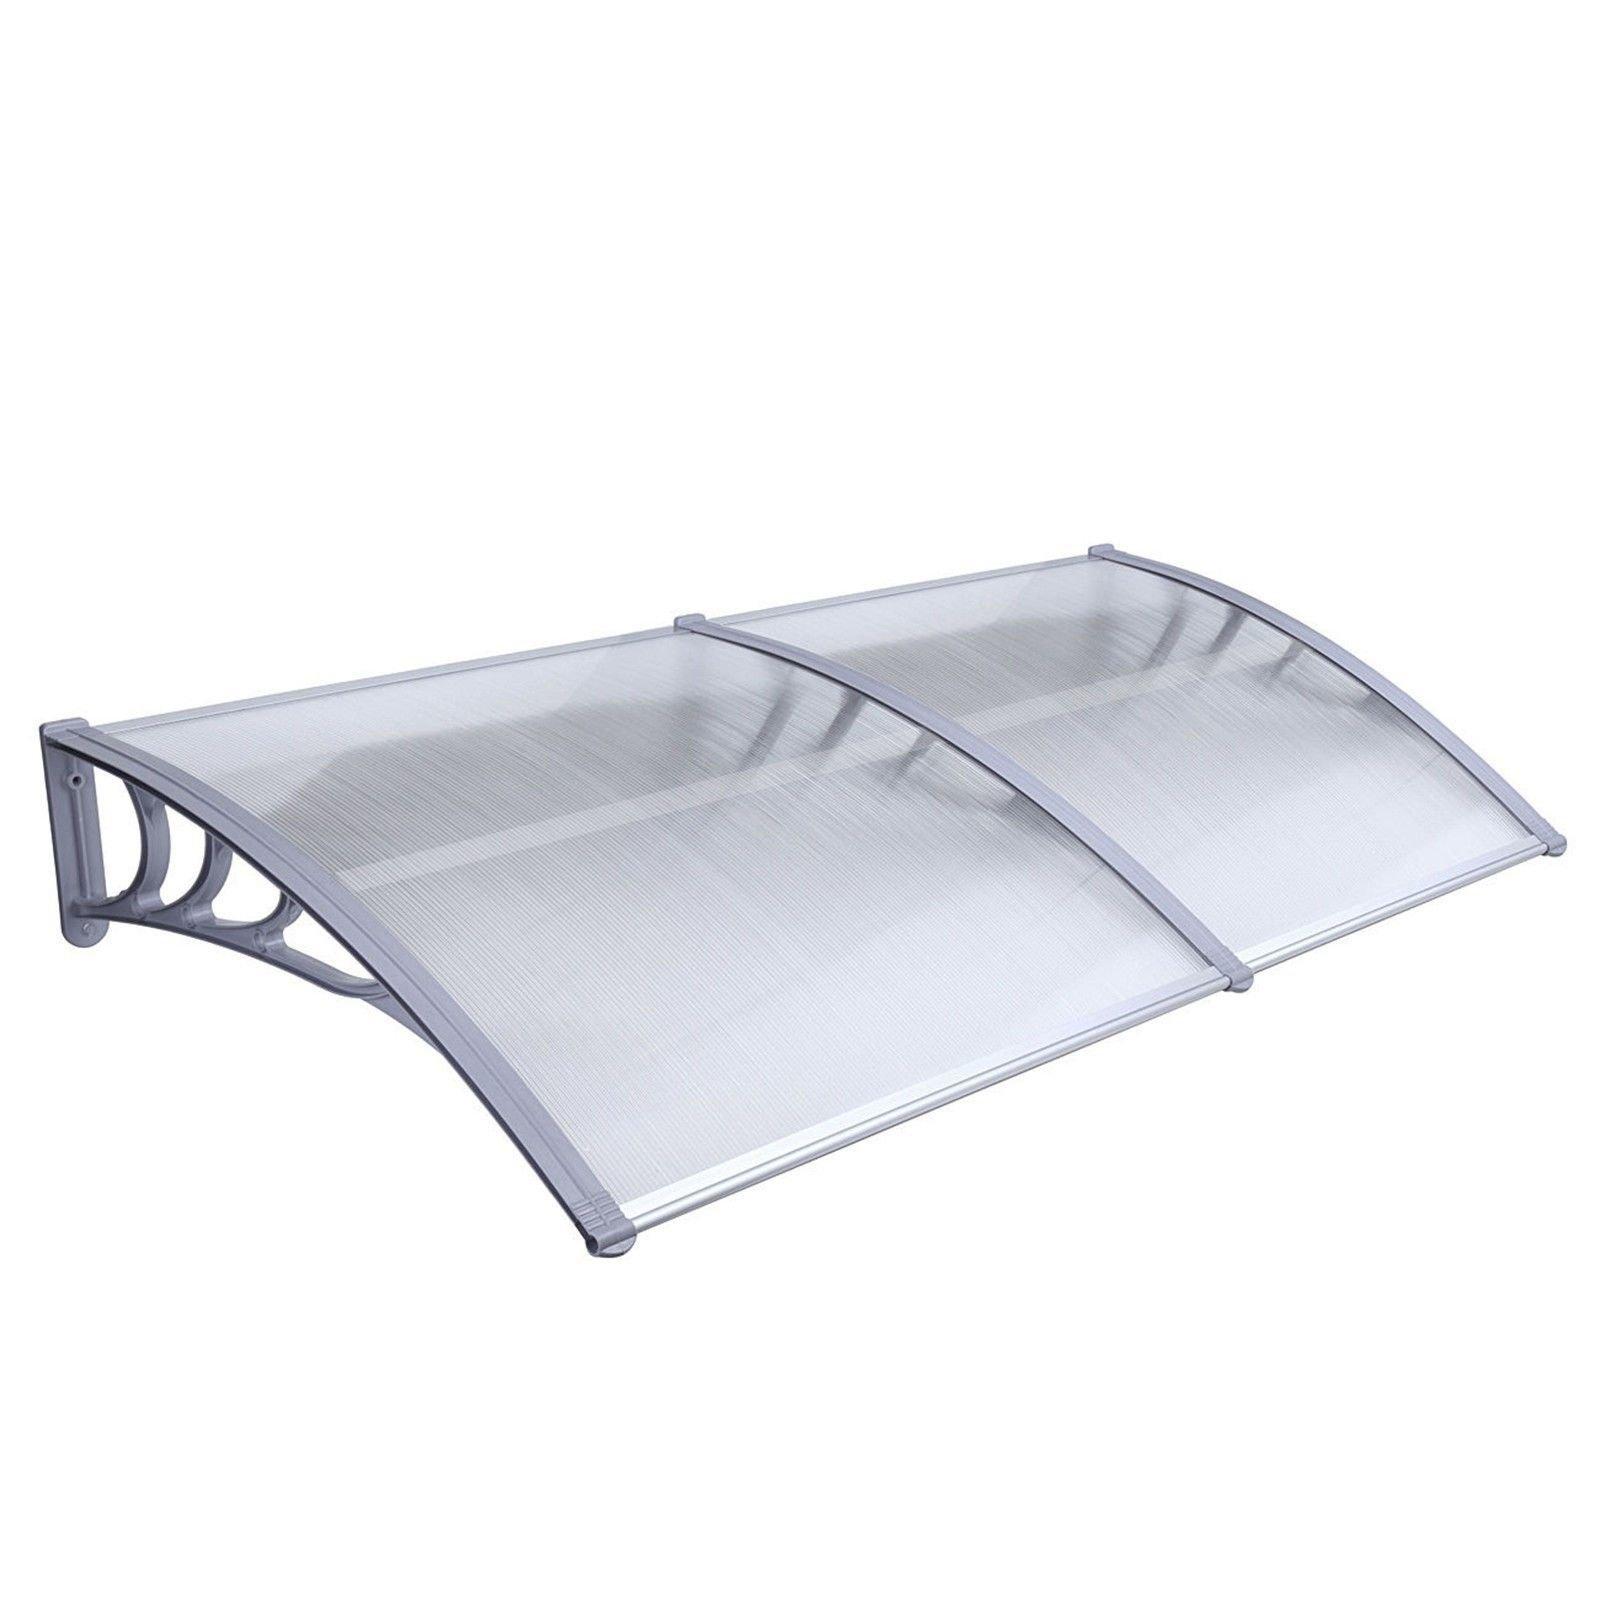 MCombo 40''×120''/40''x 80'' Window Overhead Door Awning Patio Outdoor Polycarbonate Cover Front Door Rain Sun Shetter Garden Canopy Hollow Sheet (40''x80'', White Canopy/Silver Bracket)